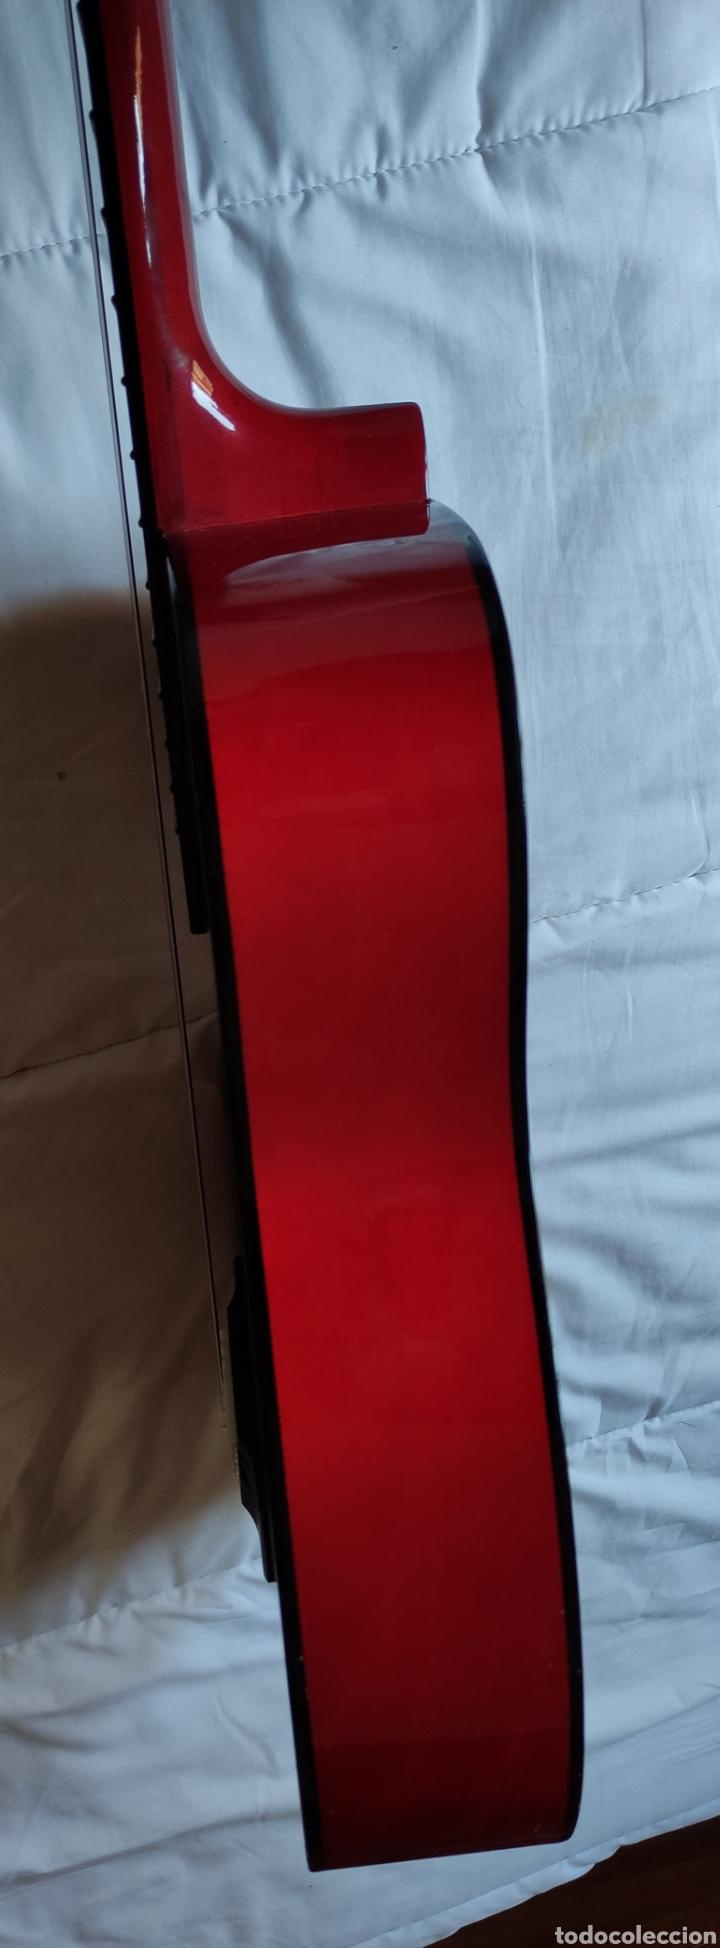 Instrumentos musicales: Guitarra - Foto 9 - 228417015